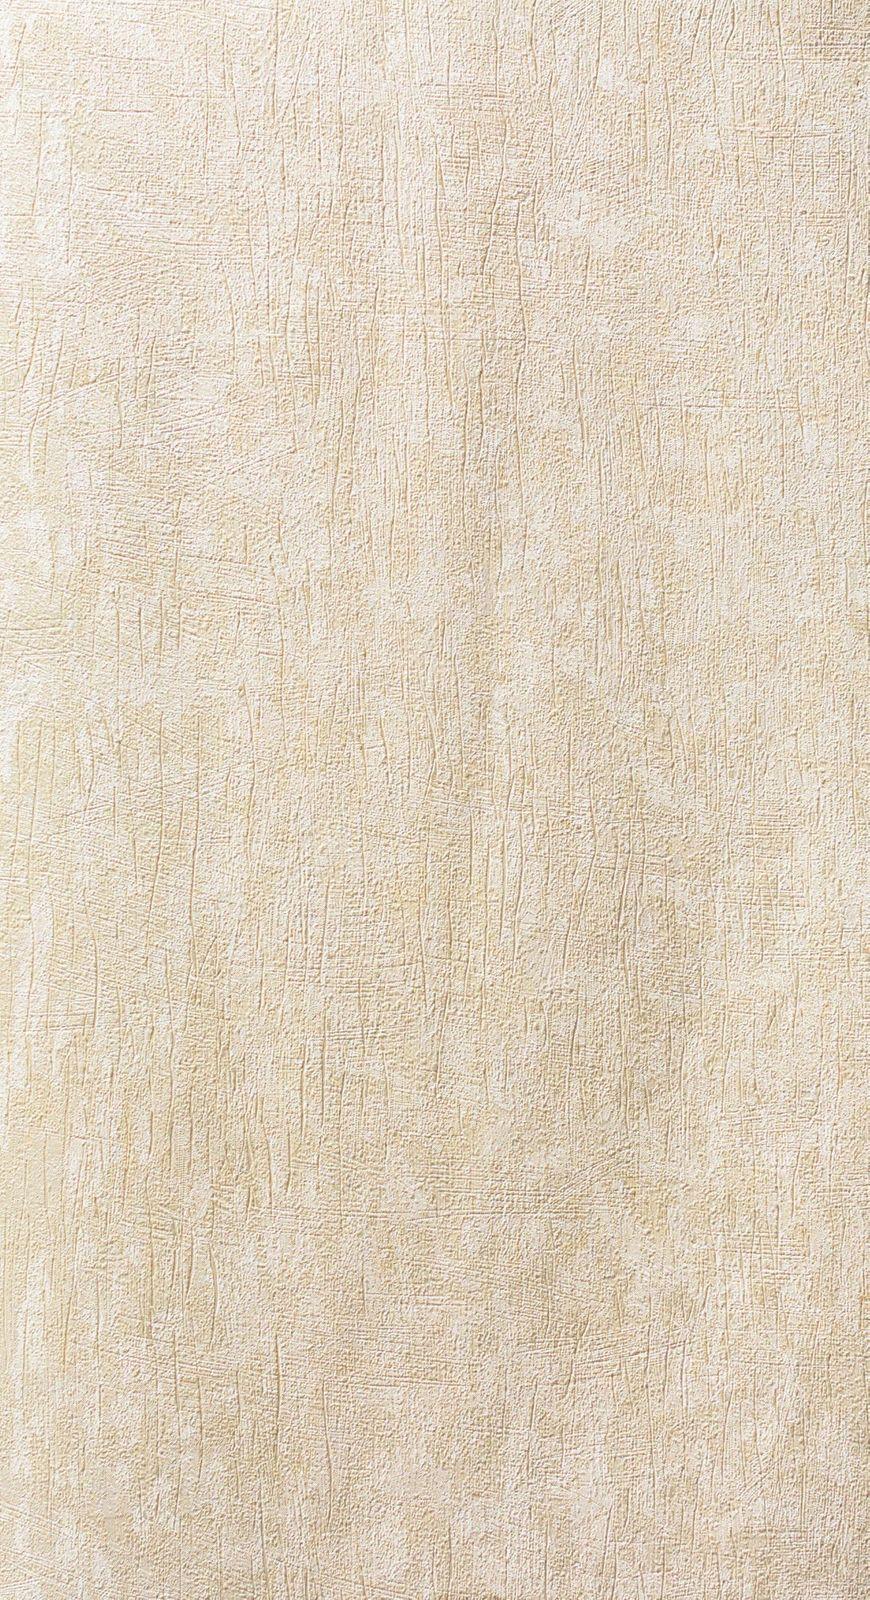 marburg tapete opulence vliestapete 0 70m breite uni gold 77850 4 75 1qm ebay. Black Bedroom Furniture Sets. Home Design Ideas